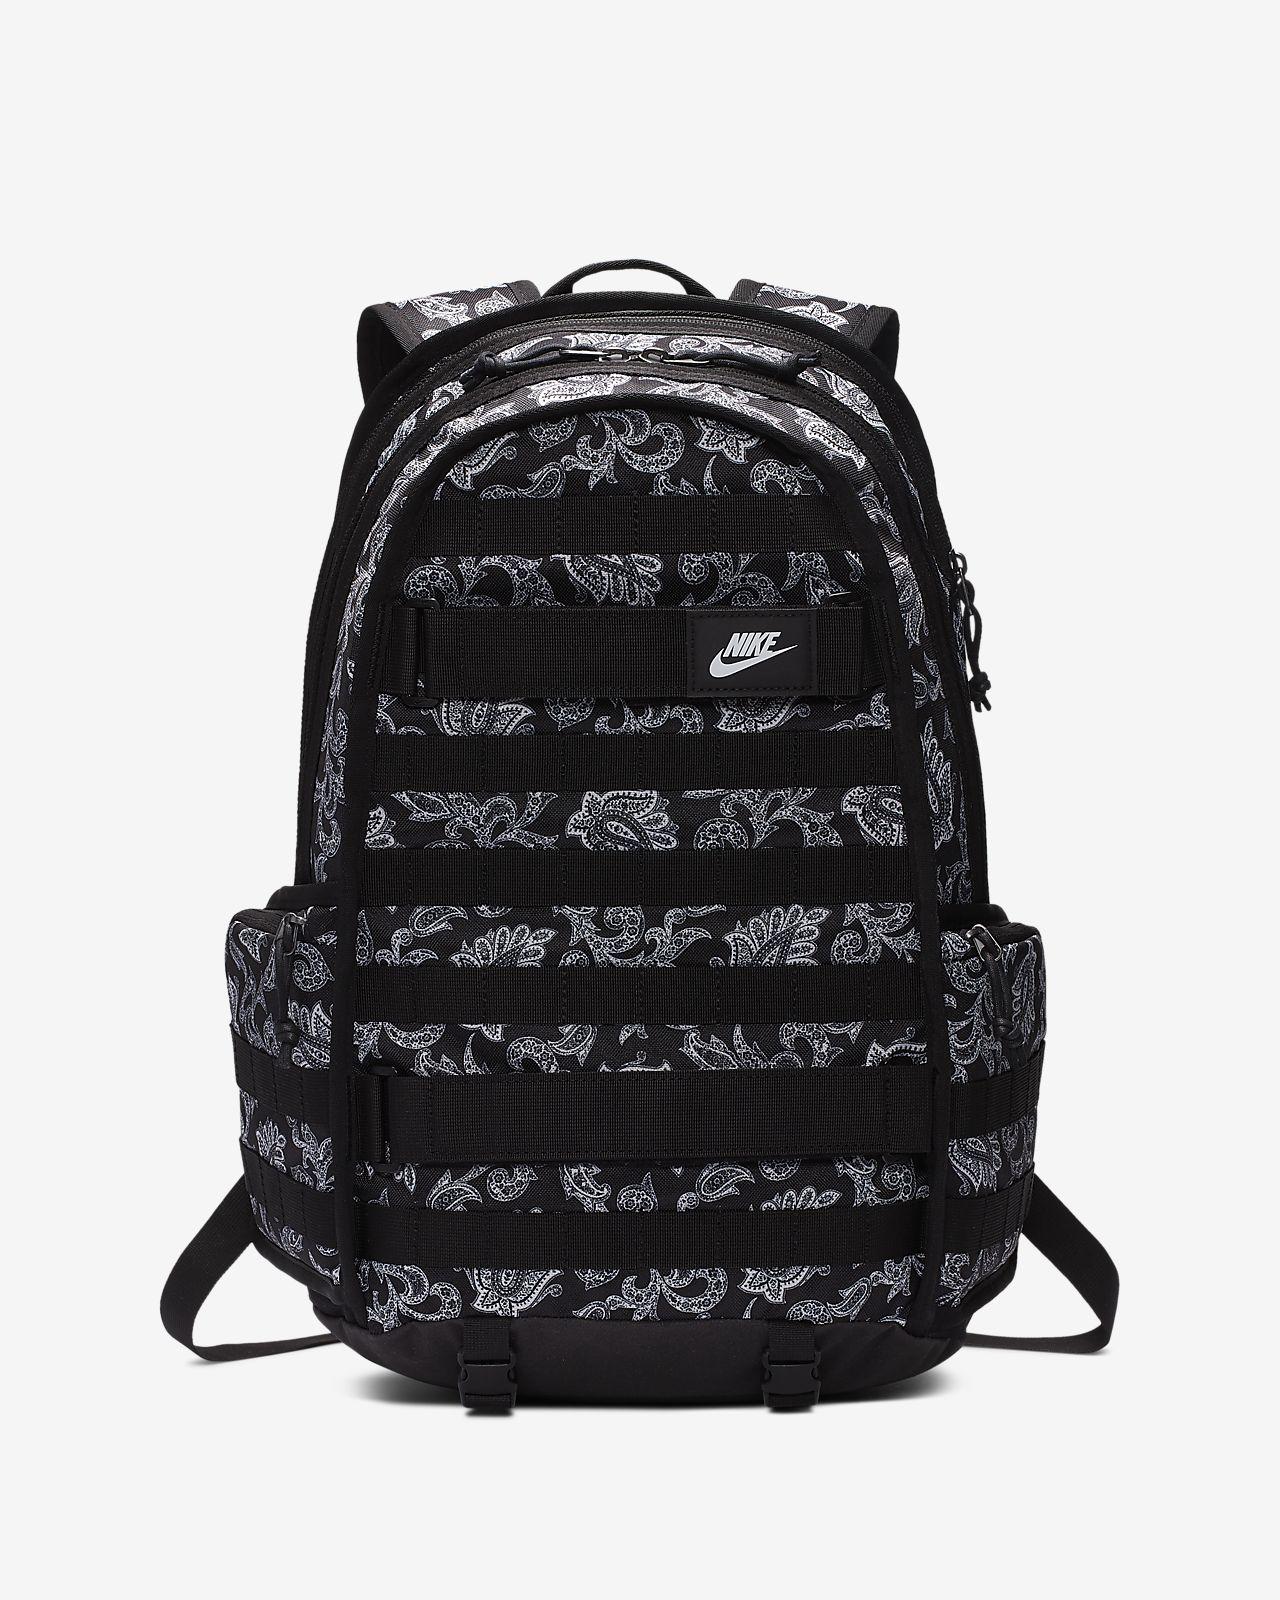 Mochila estampada Nike Sportswear RPM